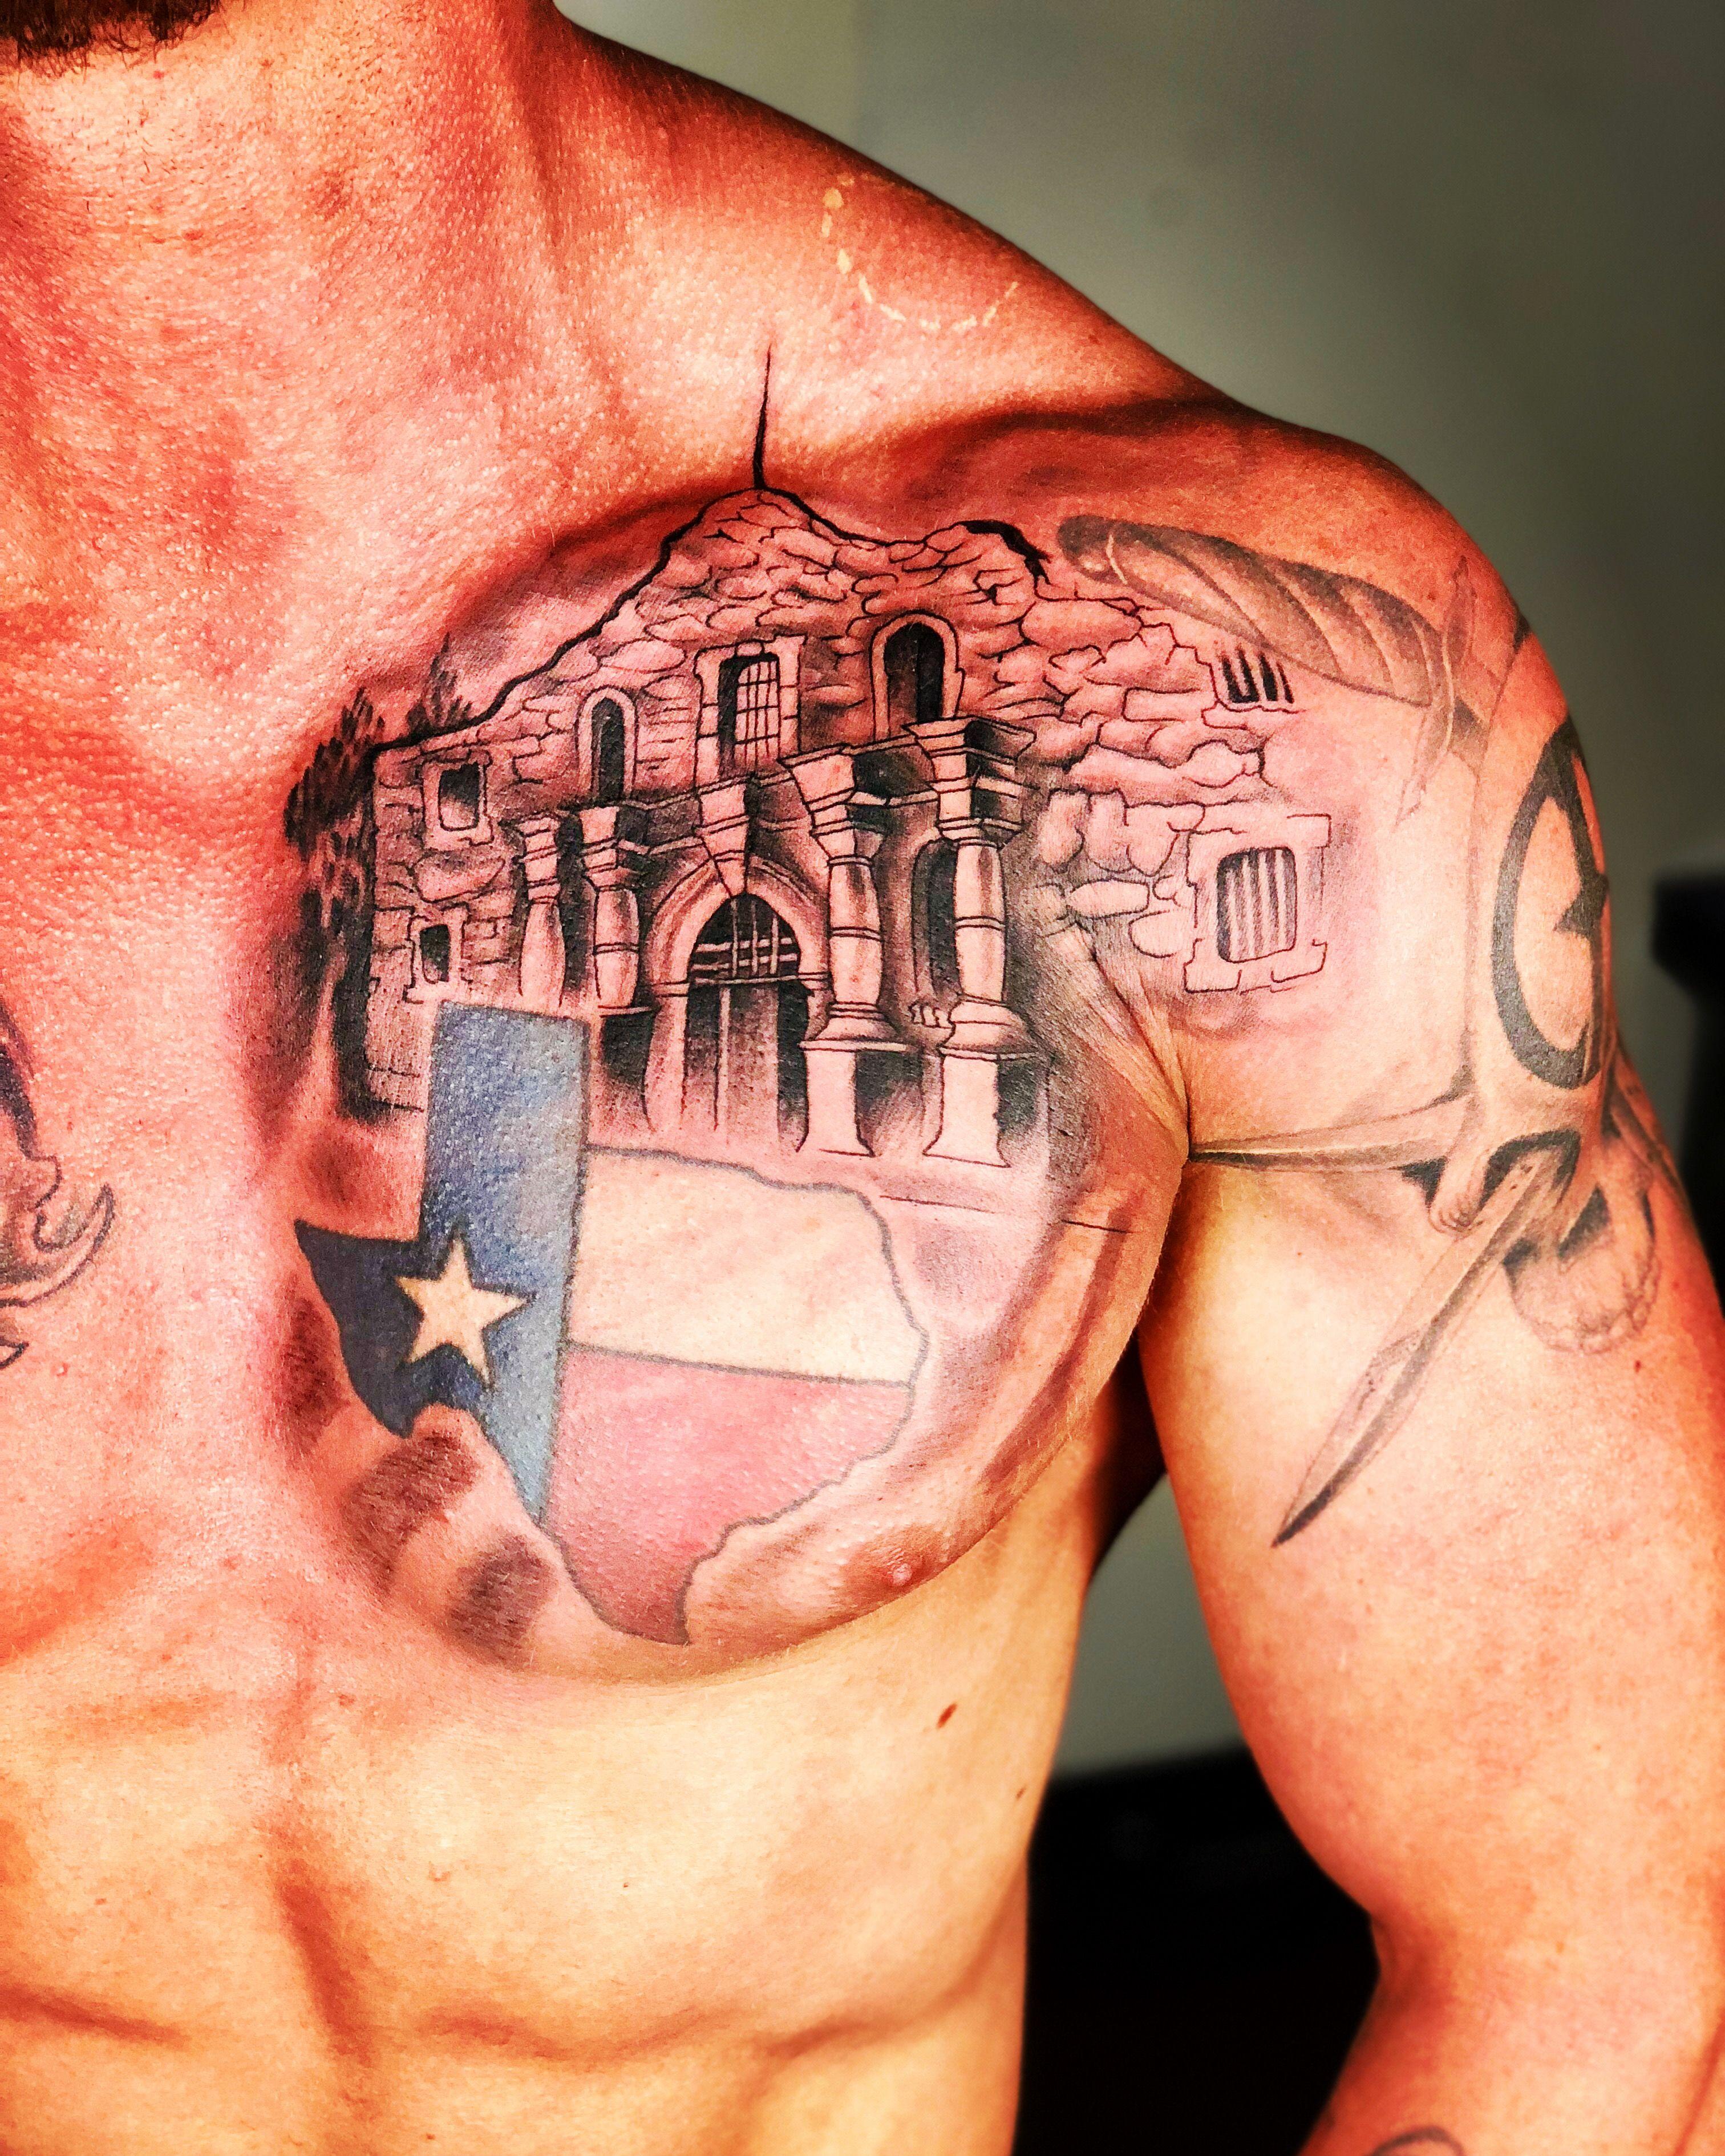 Texas Tattoo Designs : texas, tattoo, designs, Texas, Alamo, Tattoo, Cowboy, Tattoos,, Chest